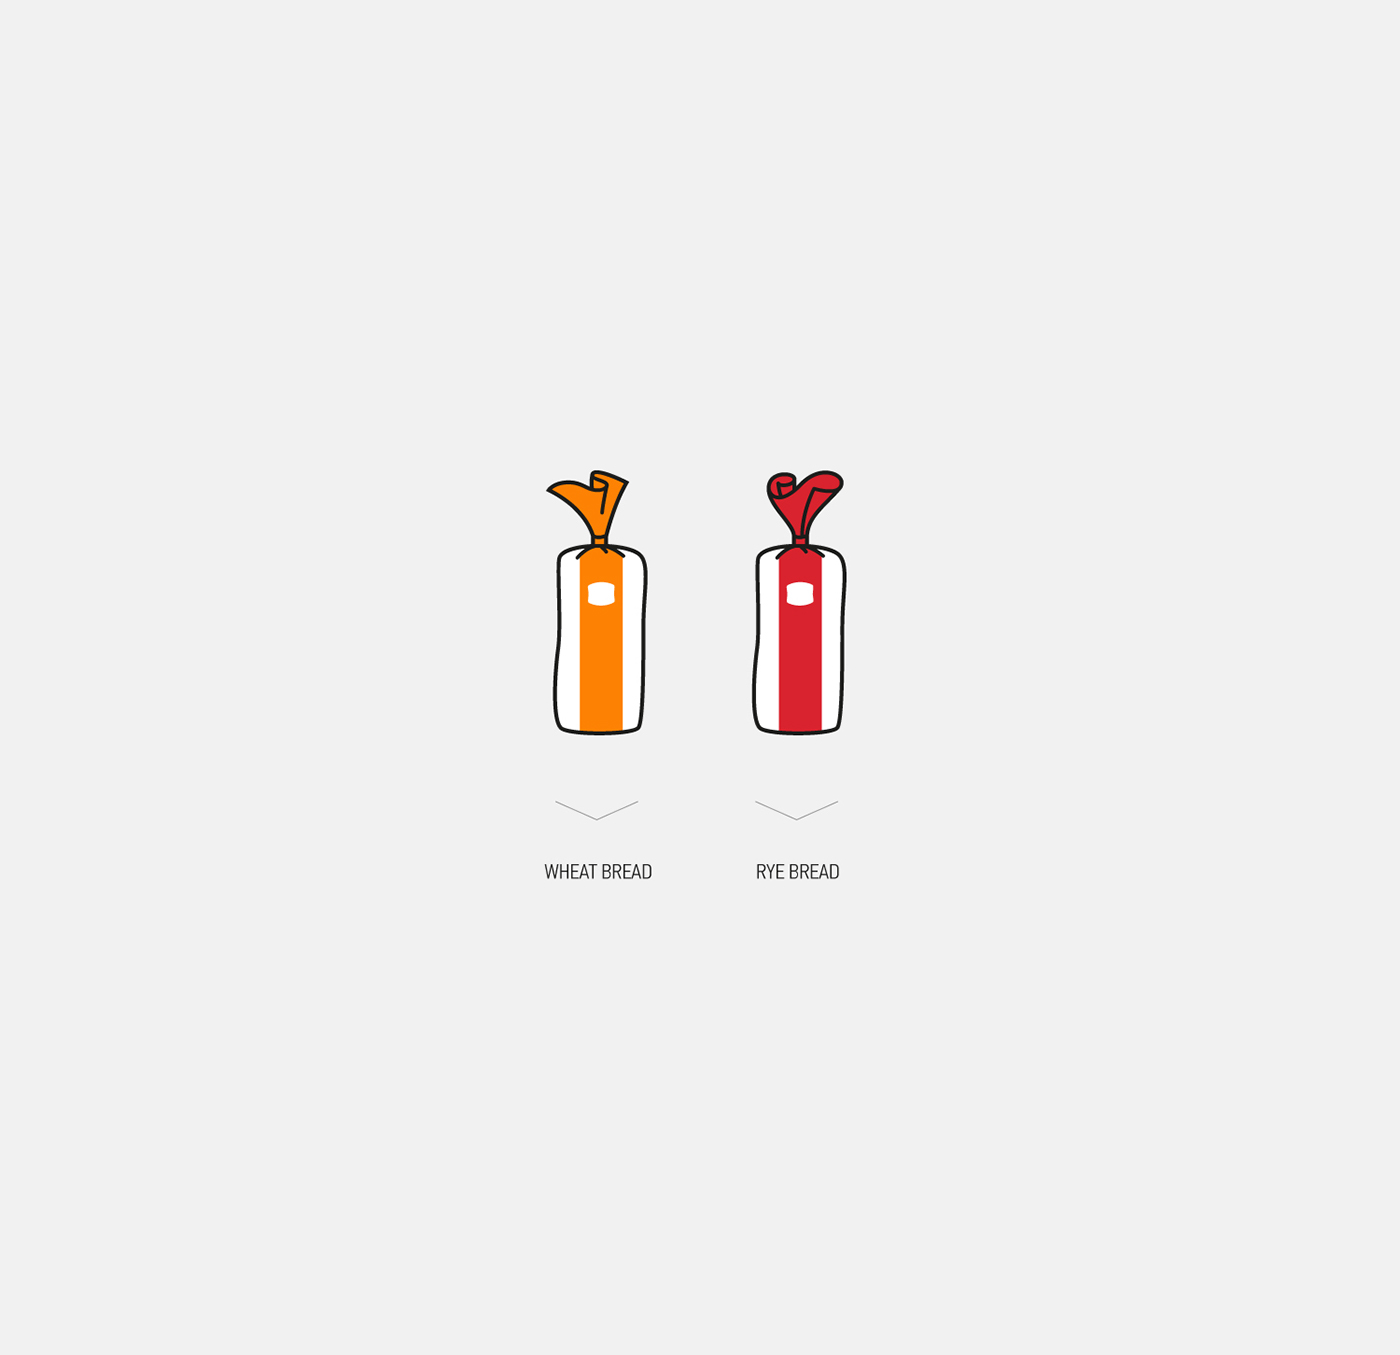 logo Packaging Positive Character герой упаковка херсон bread identity happy